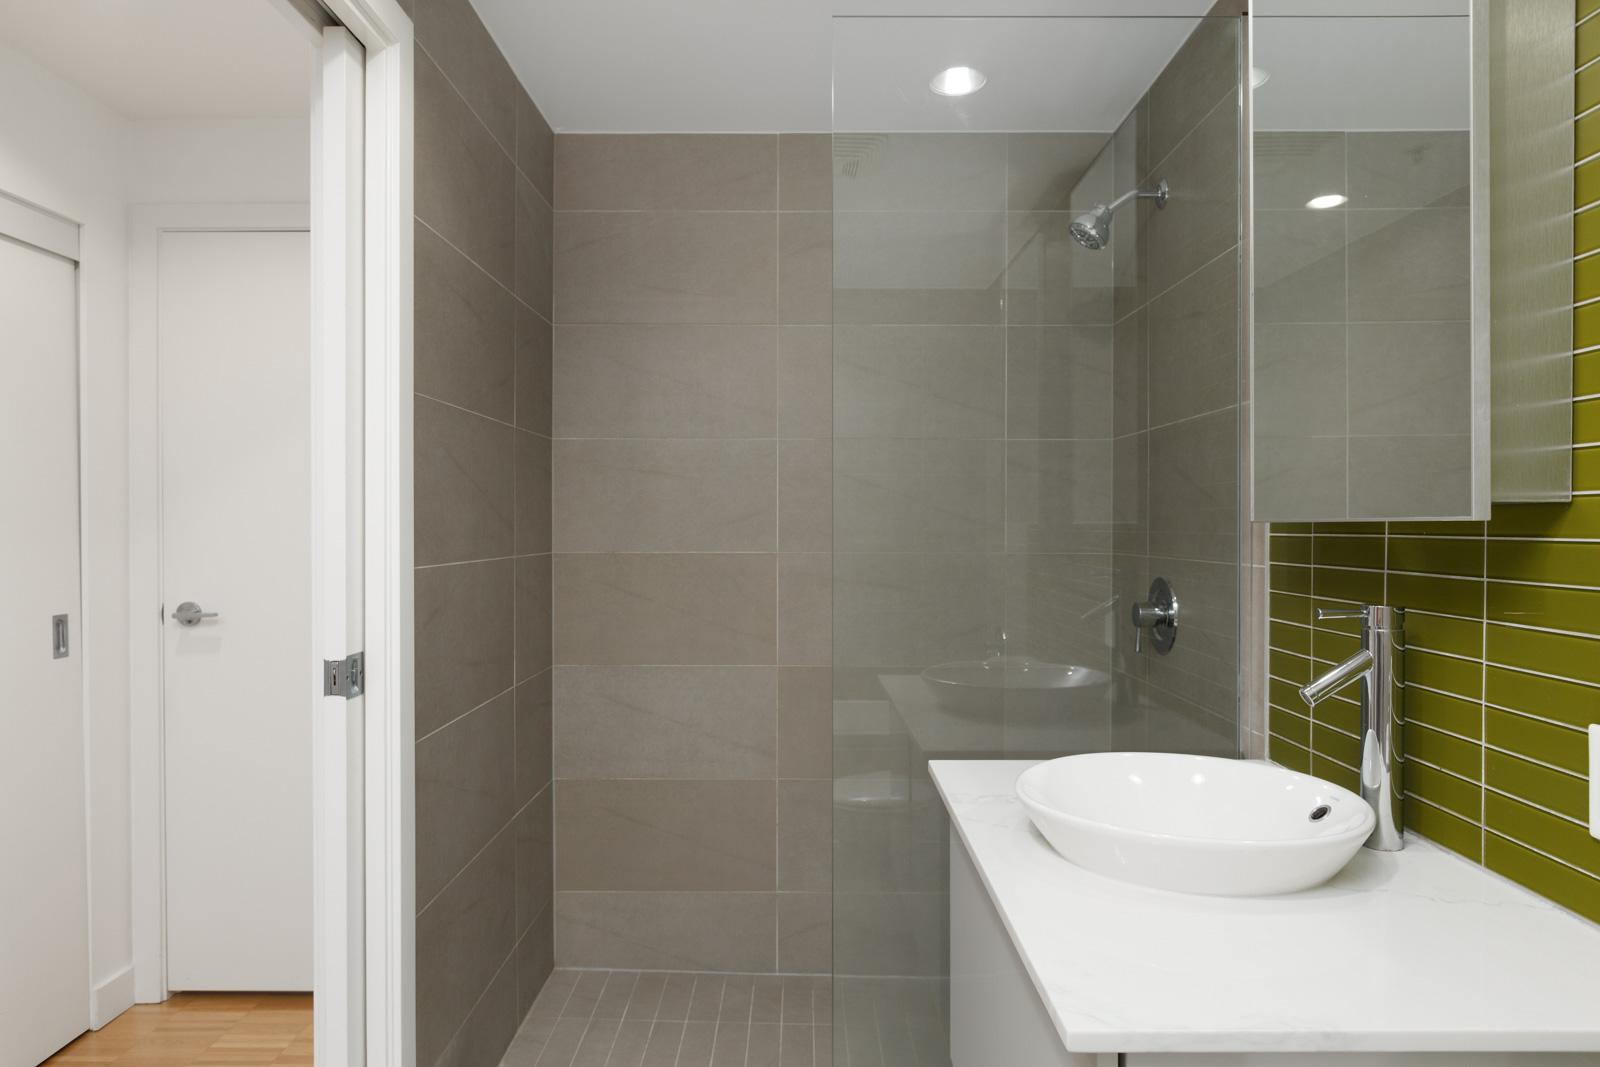 Bathroom with grey walls and huge mirror